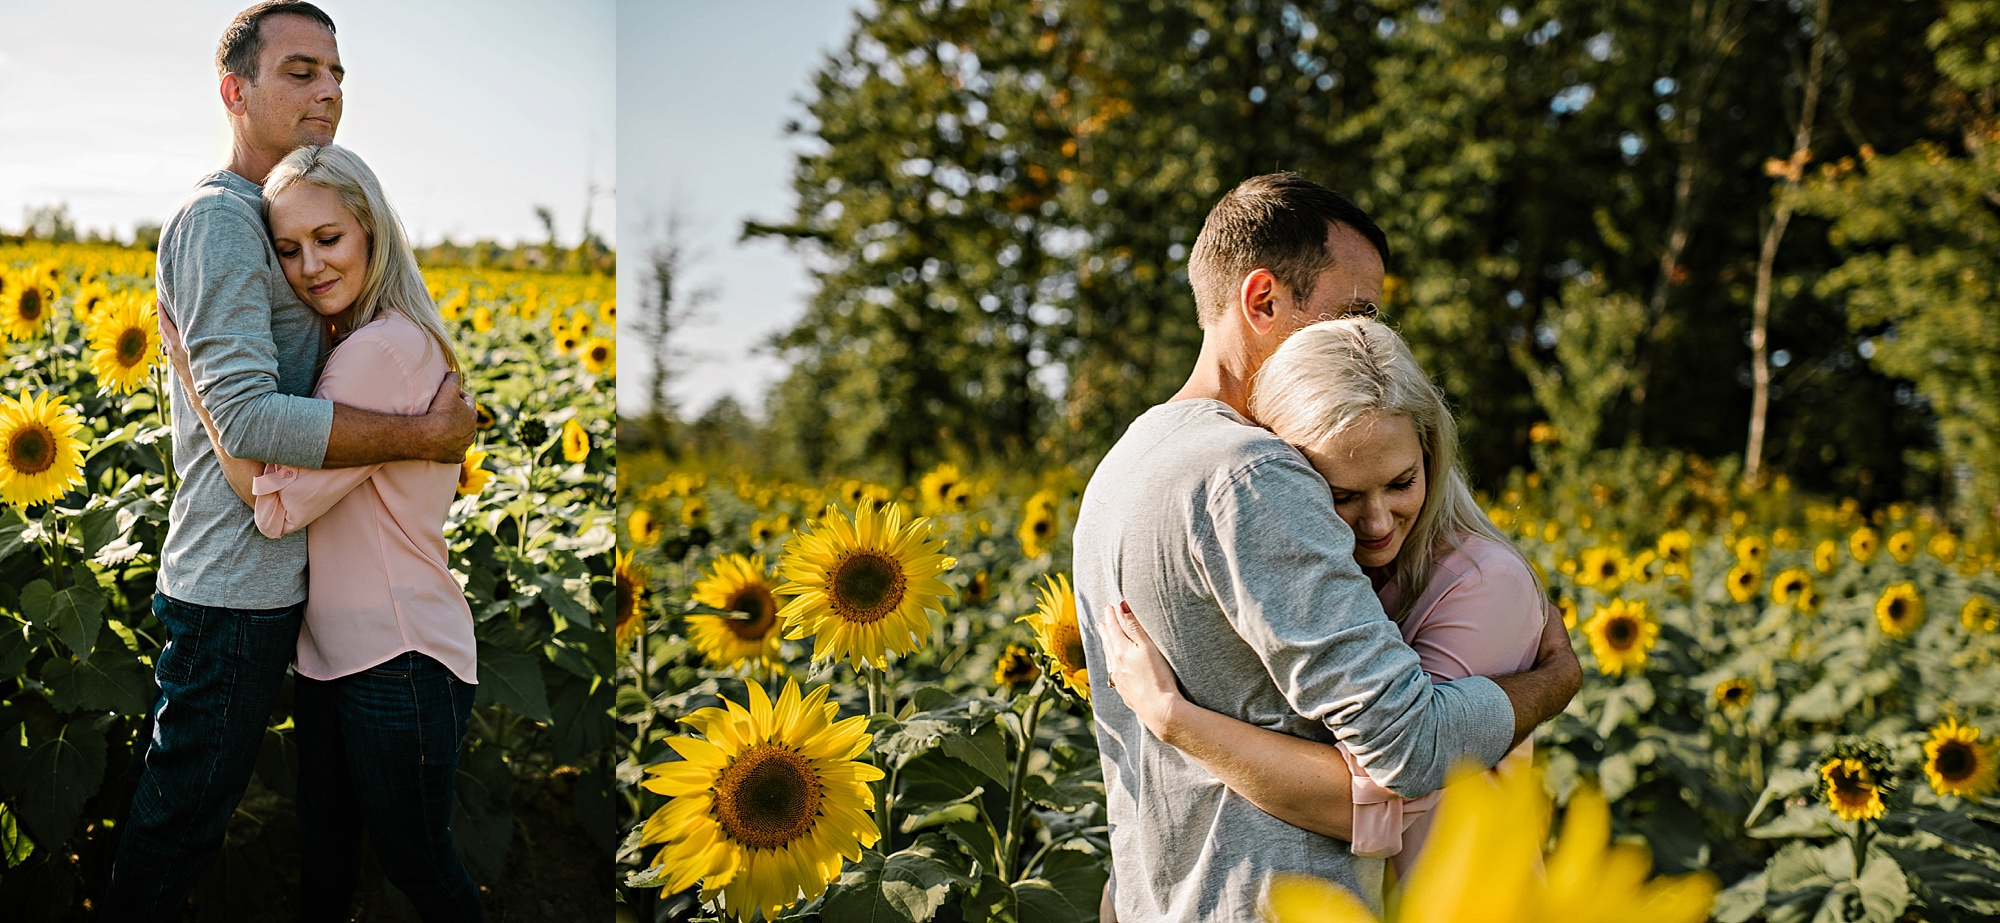 Lori-and-mike-akron-ohio-photographer-lauren-grayson-sunflower-field-session_0009.jpg